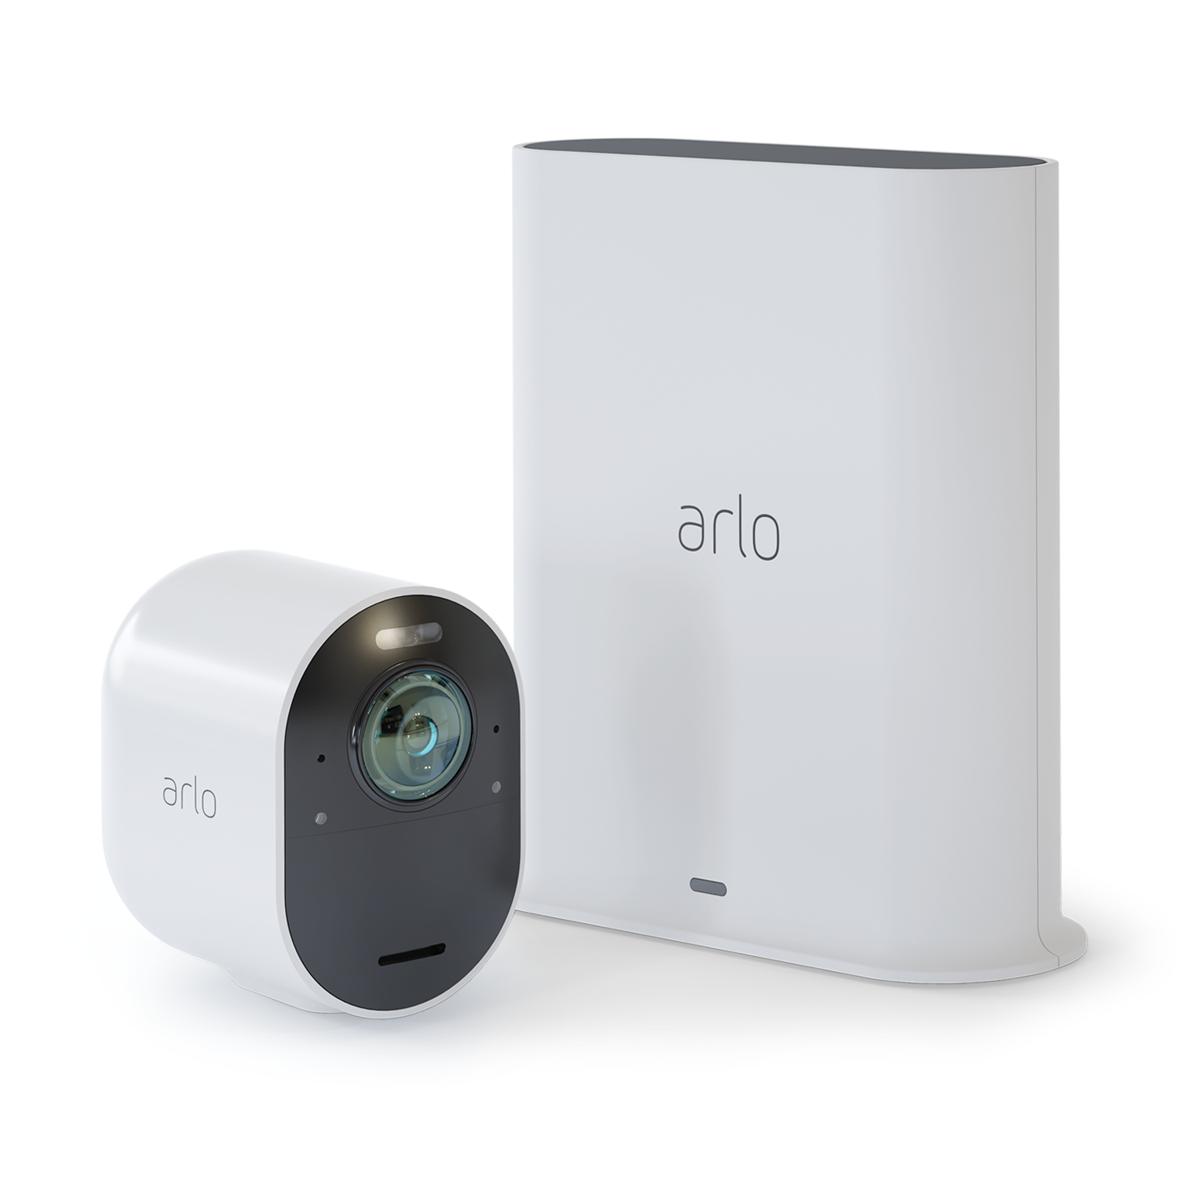 ArloUltra_CameraAndSmartHub.134220 Arlo annonce la disponibilité du système de caméra sans fils Arlo Ultra 4K HDR